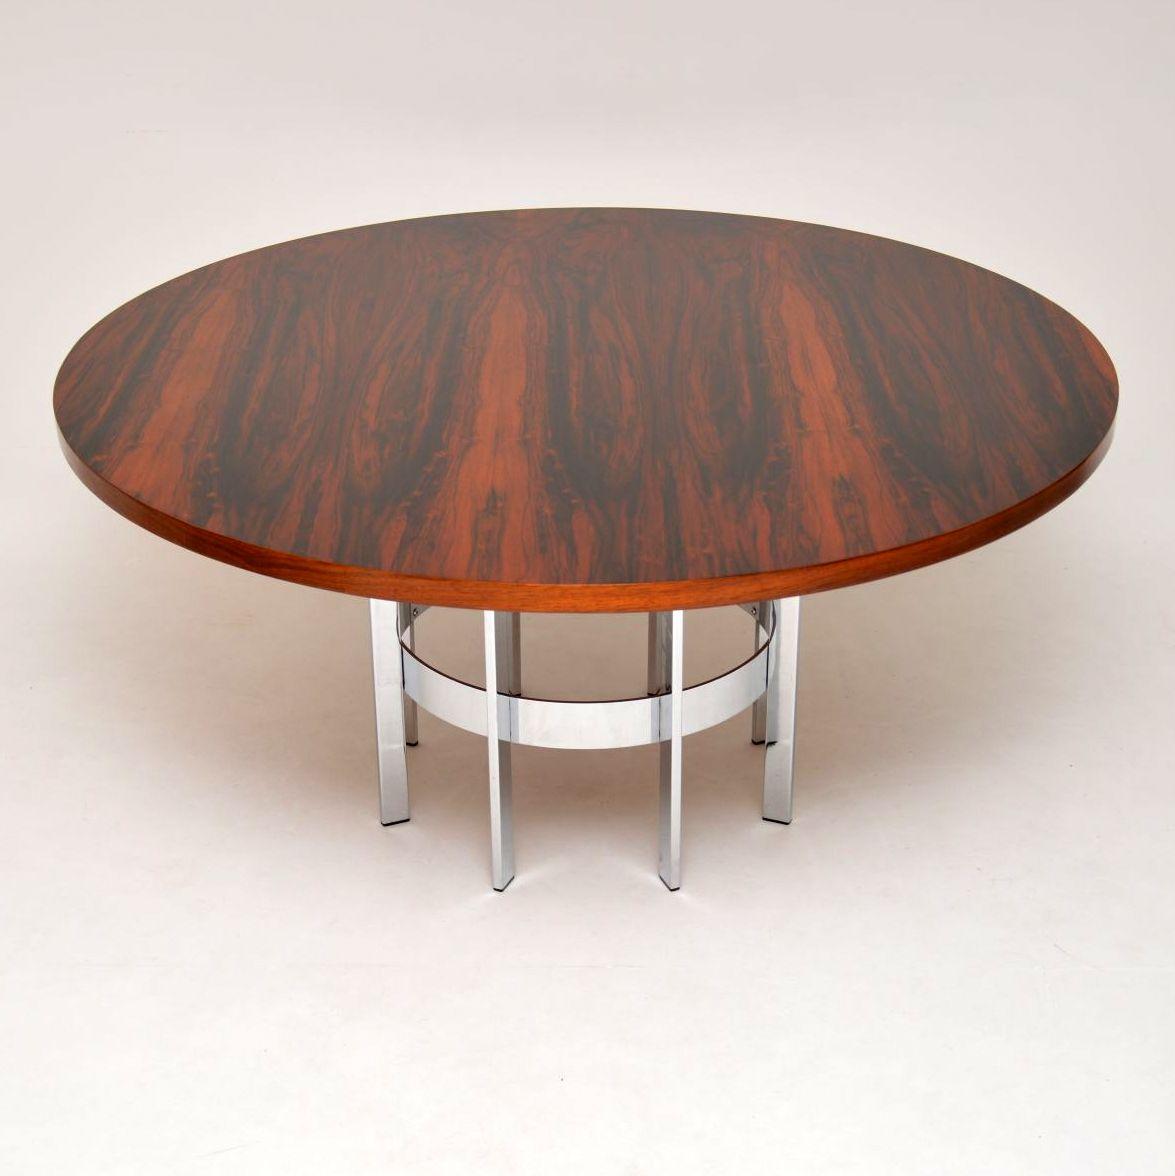 Retrospective Interiors & 1960\u0027s Vintage Rosewood \u0026 Chrome Dining Table by Merrow Associates